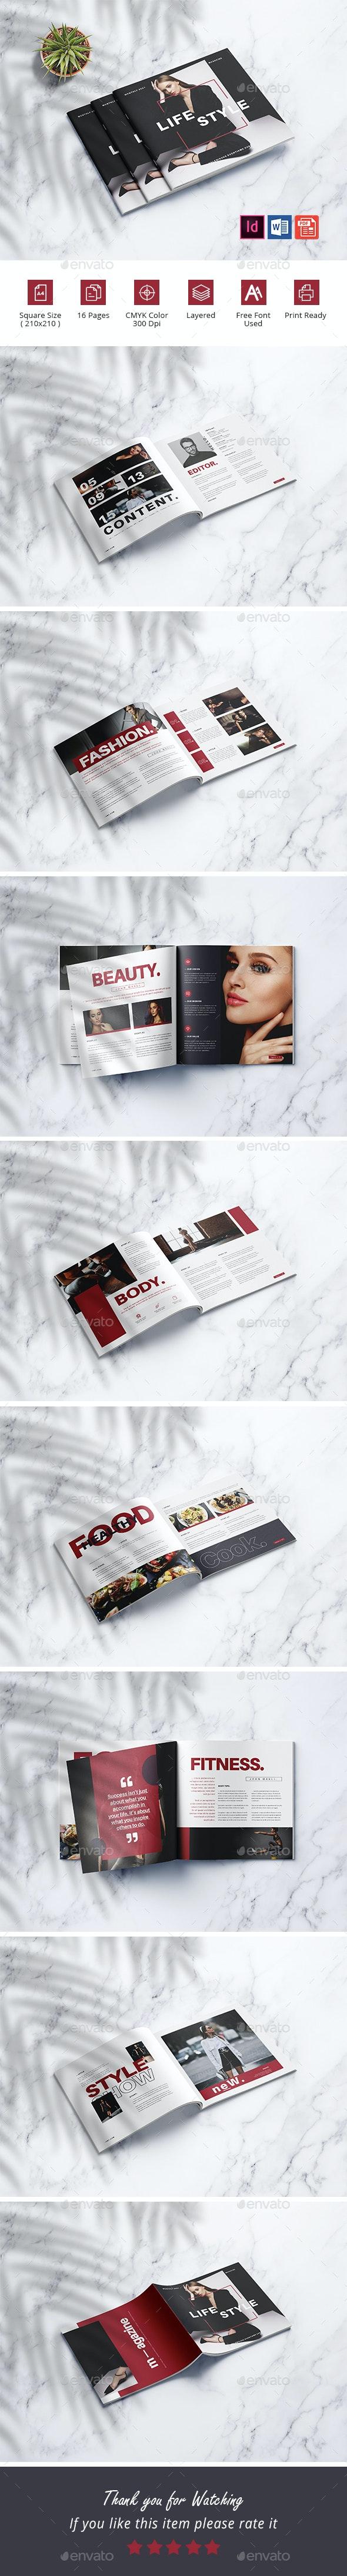 Minimalist Magazine Template - Magazines Print Templates